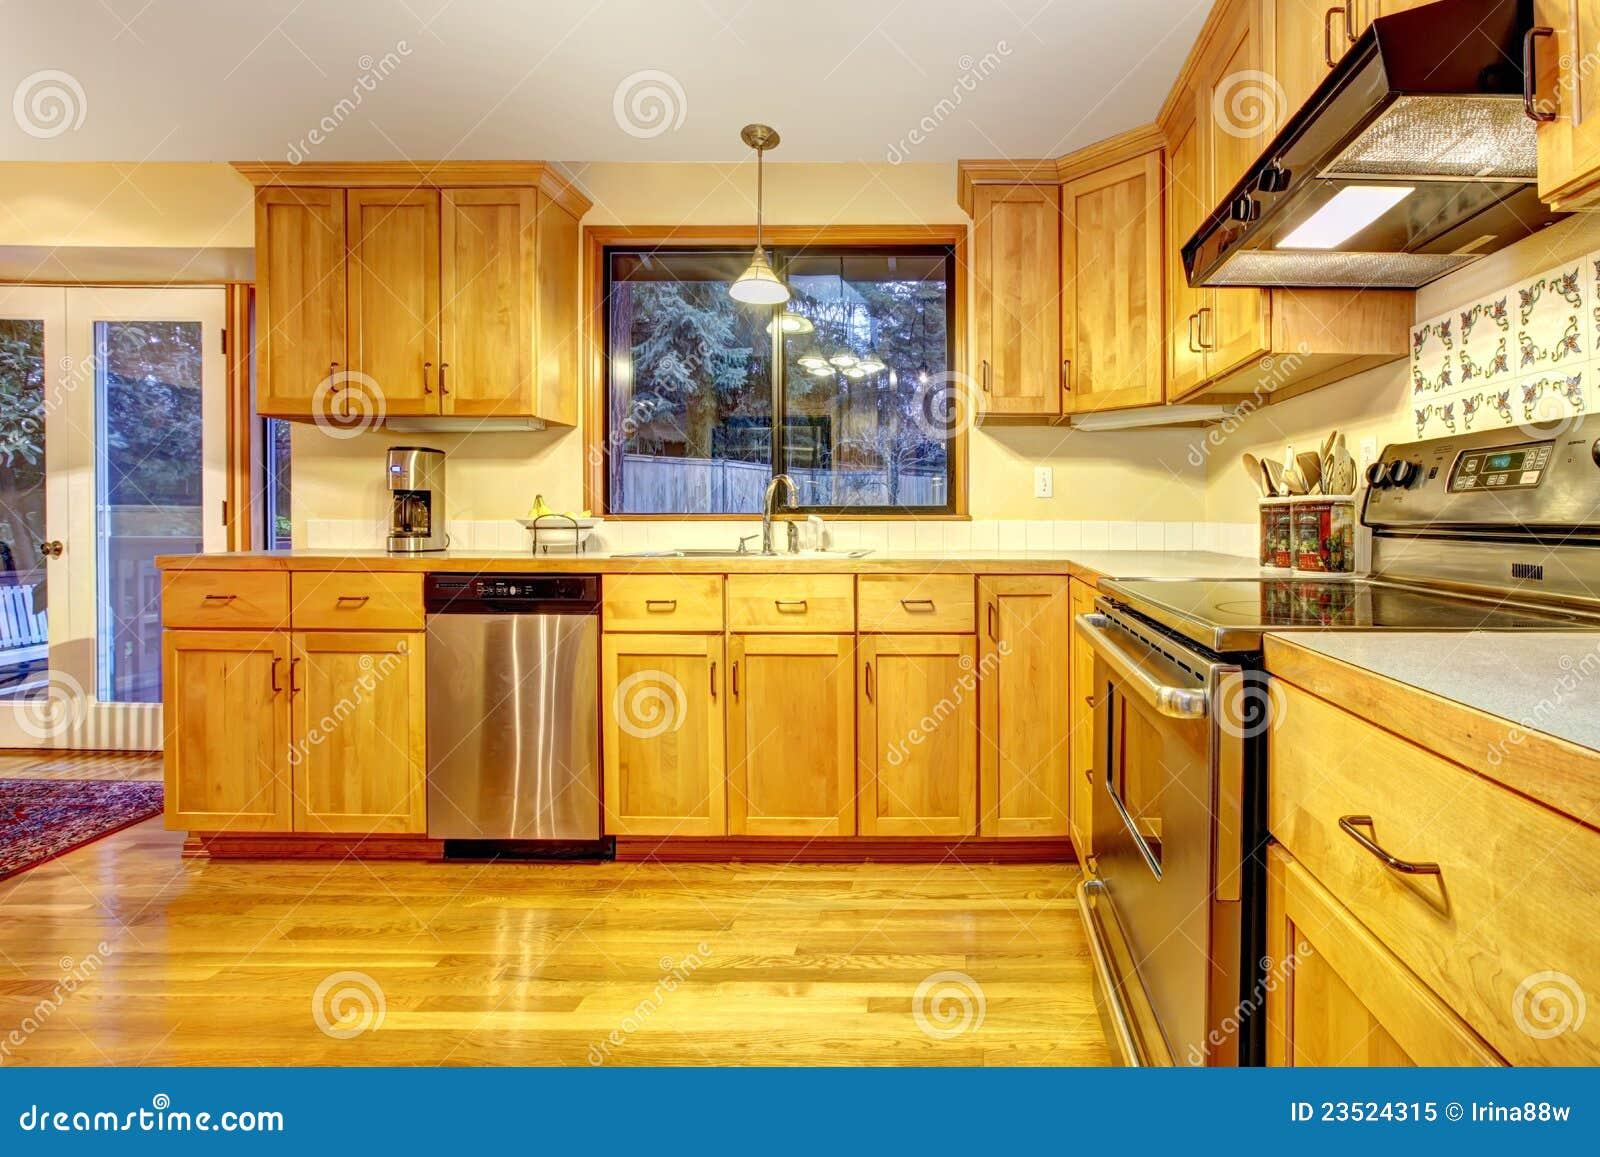 Gouden Houten Keuken Met Hardhoutvloer. Royalty-vrije Stock Foto ...